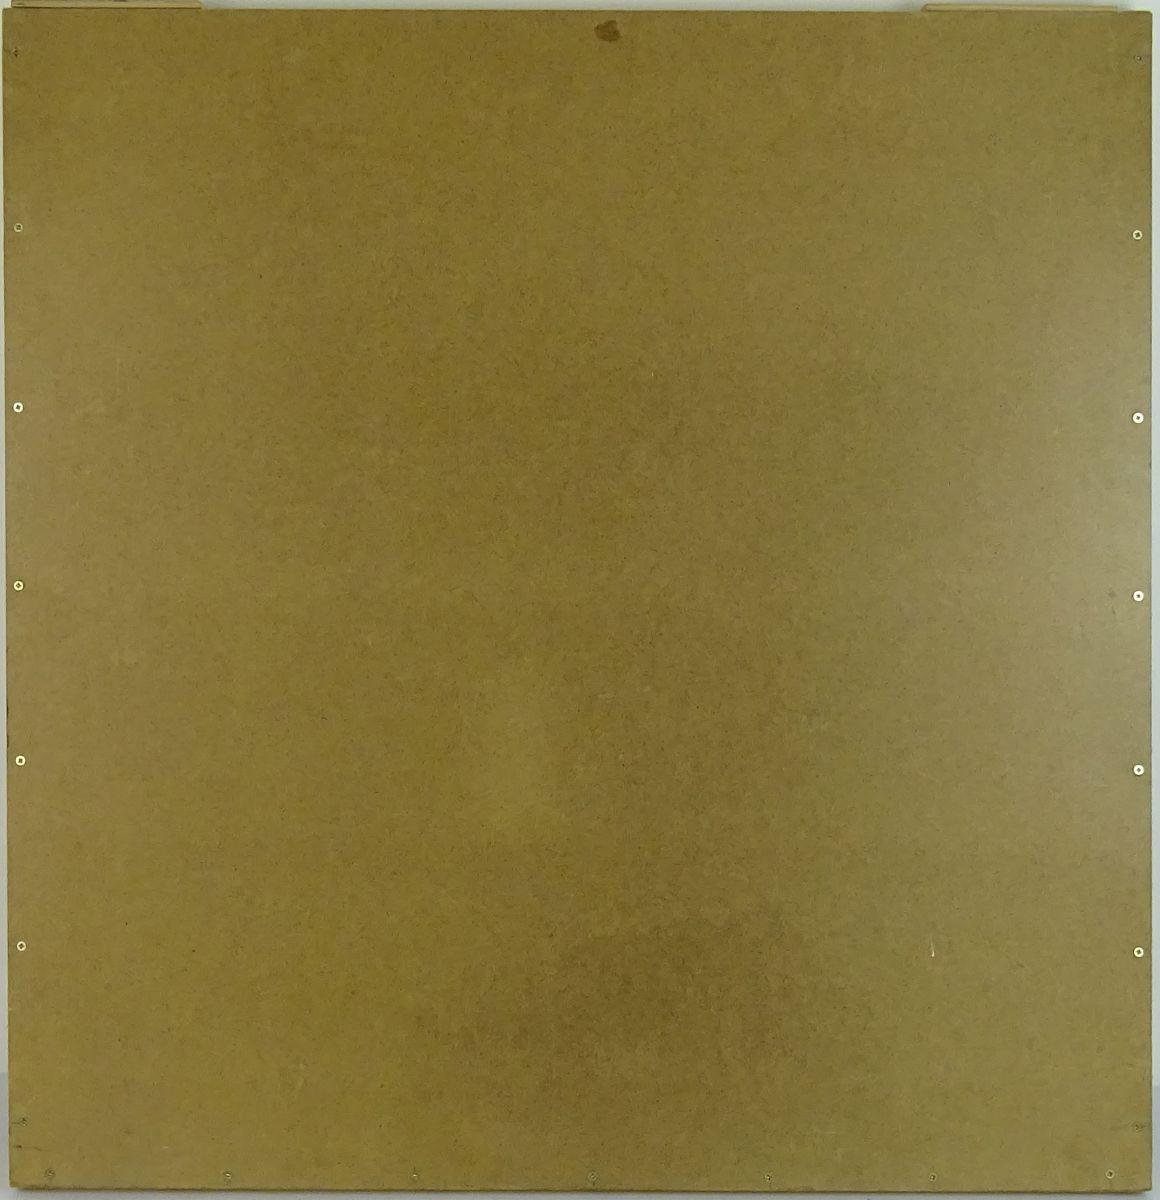 DSC05695.JPG (1160×1200)